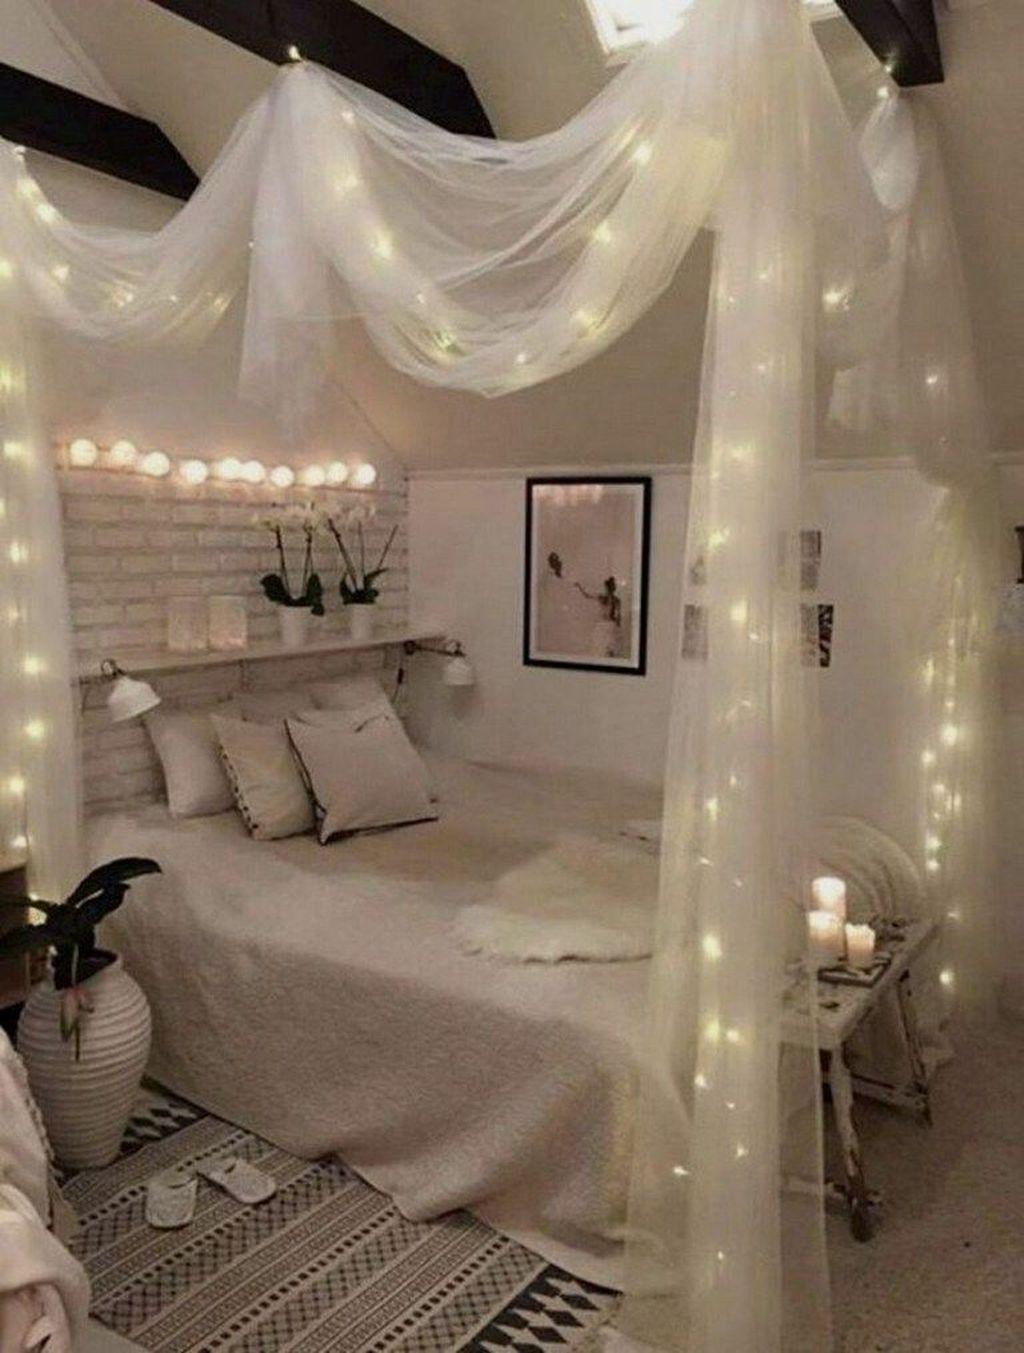 33 Stunning Romantic Bedroom Decor Ideas You Will Love Homyhomee Diy Home Room Stylish Design